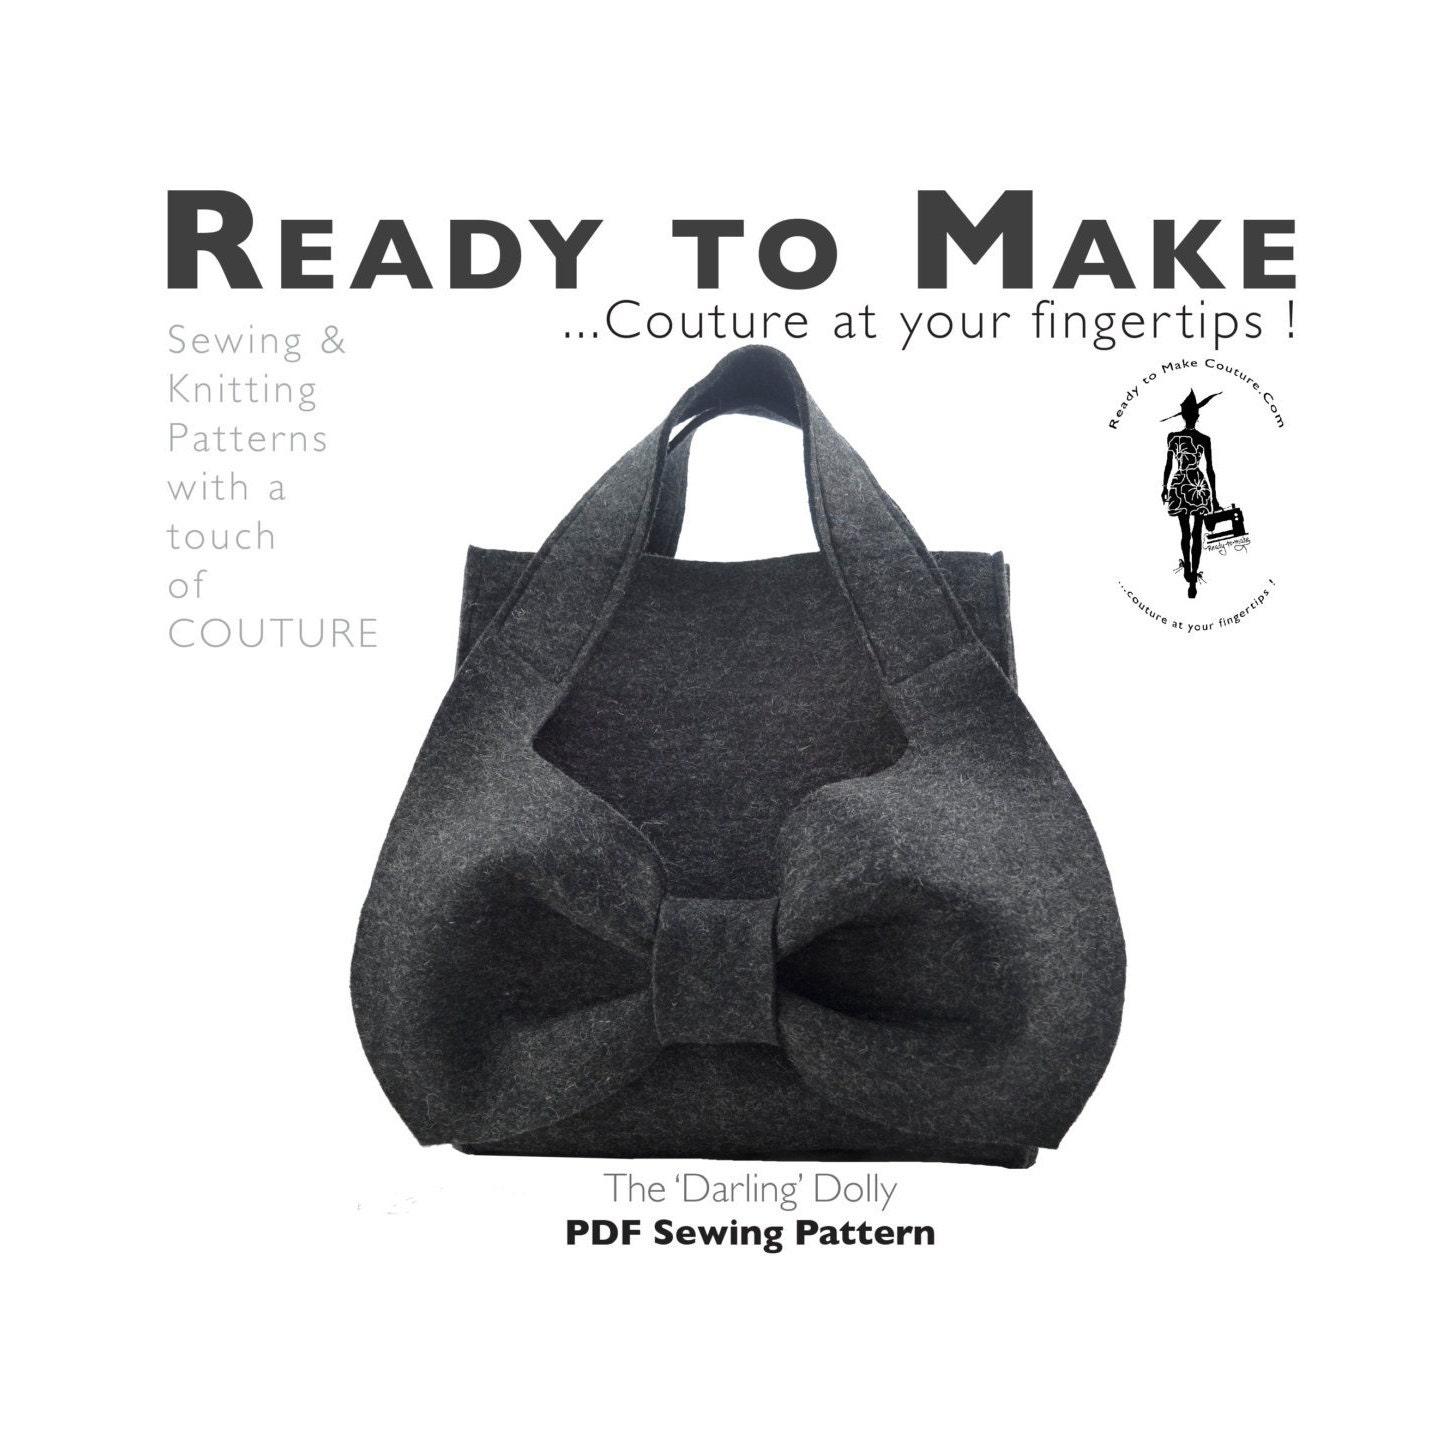 Patrón de costura PDF moda diseñador bolso Hobo bolso hecho | Etsy